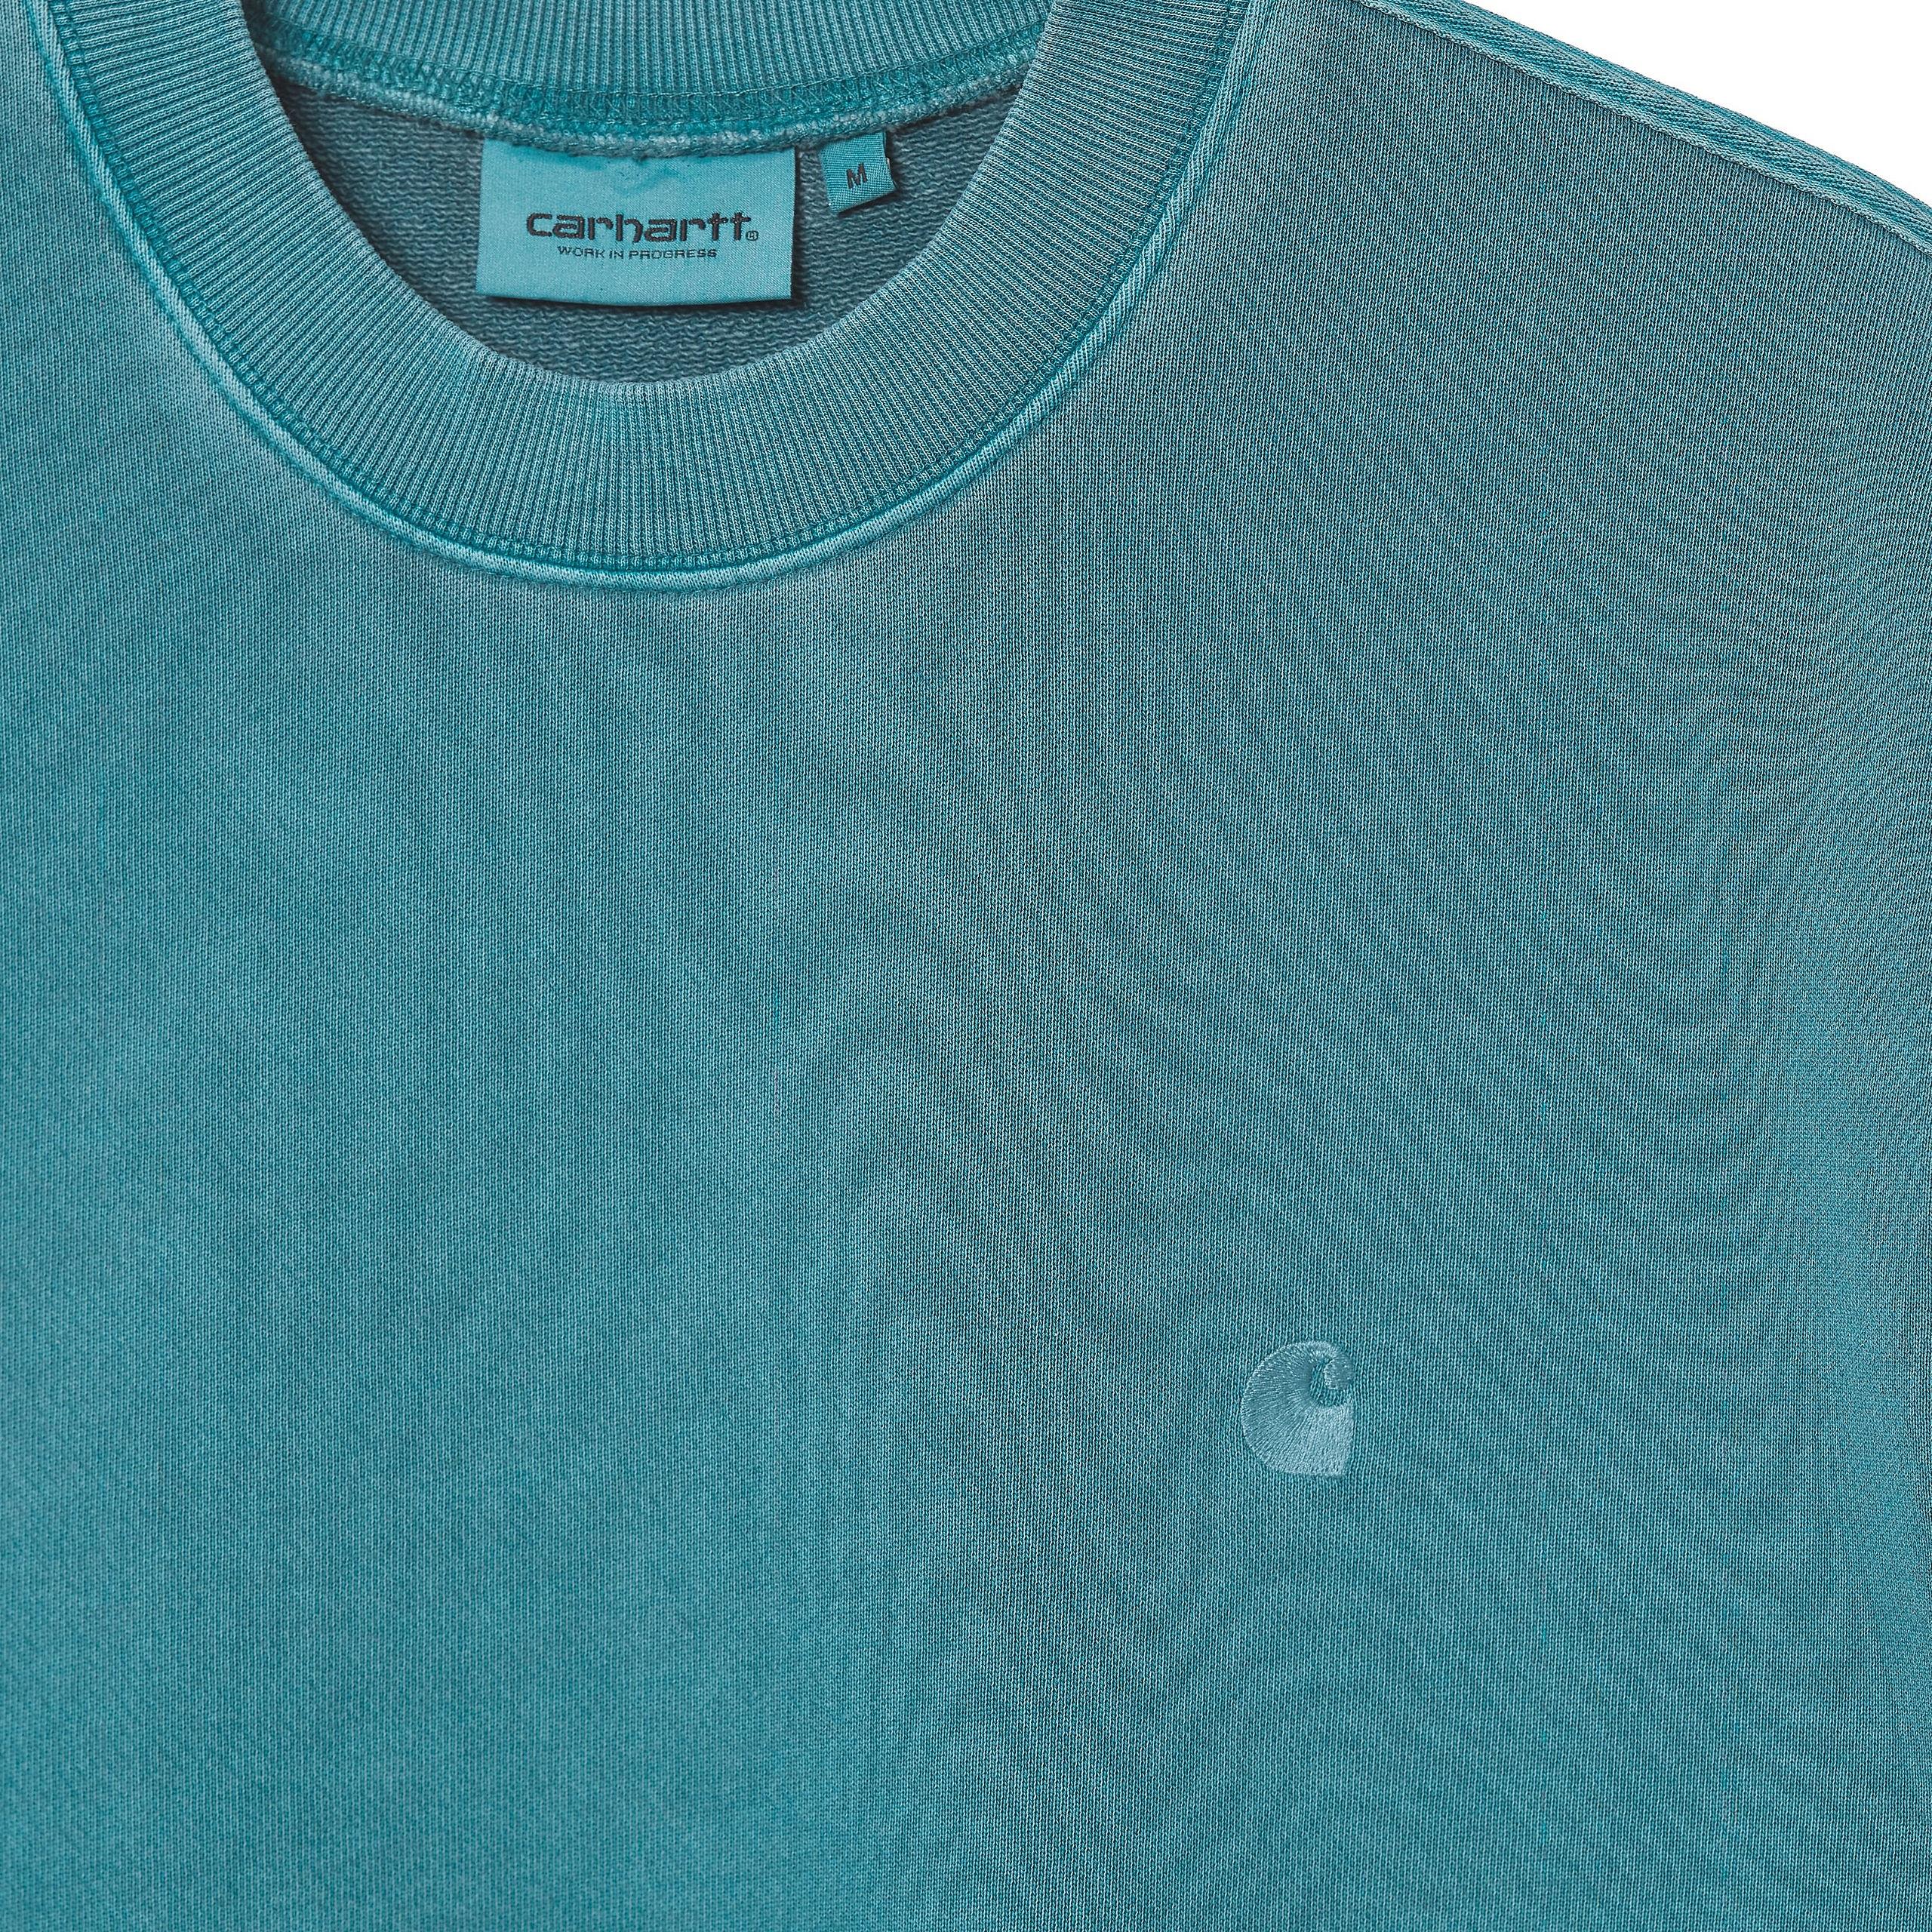 Carhartt felpa sedona uomo azzurro CARHARTT WIP | Felpe | I0289640AC.00